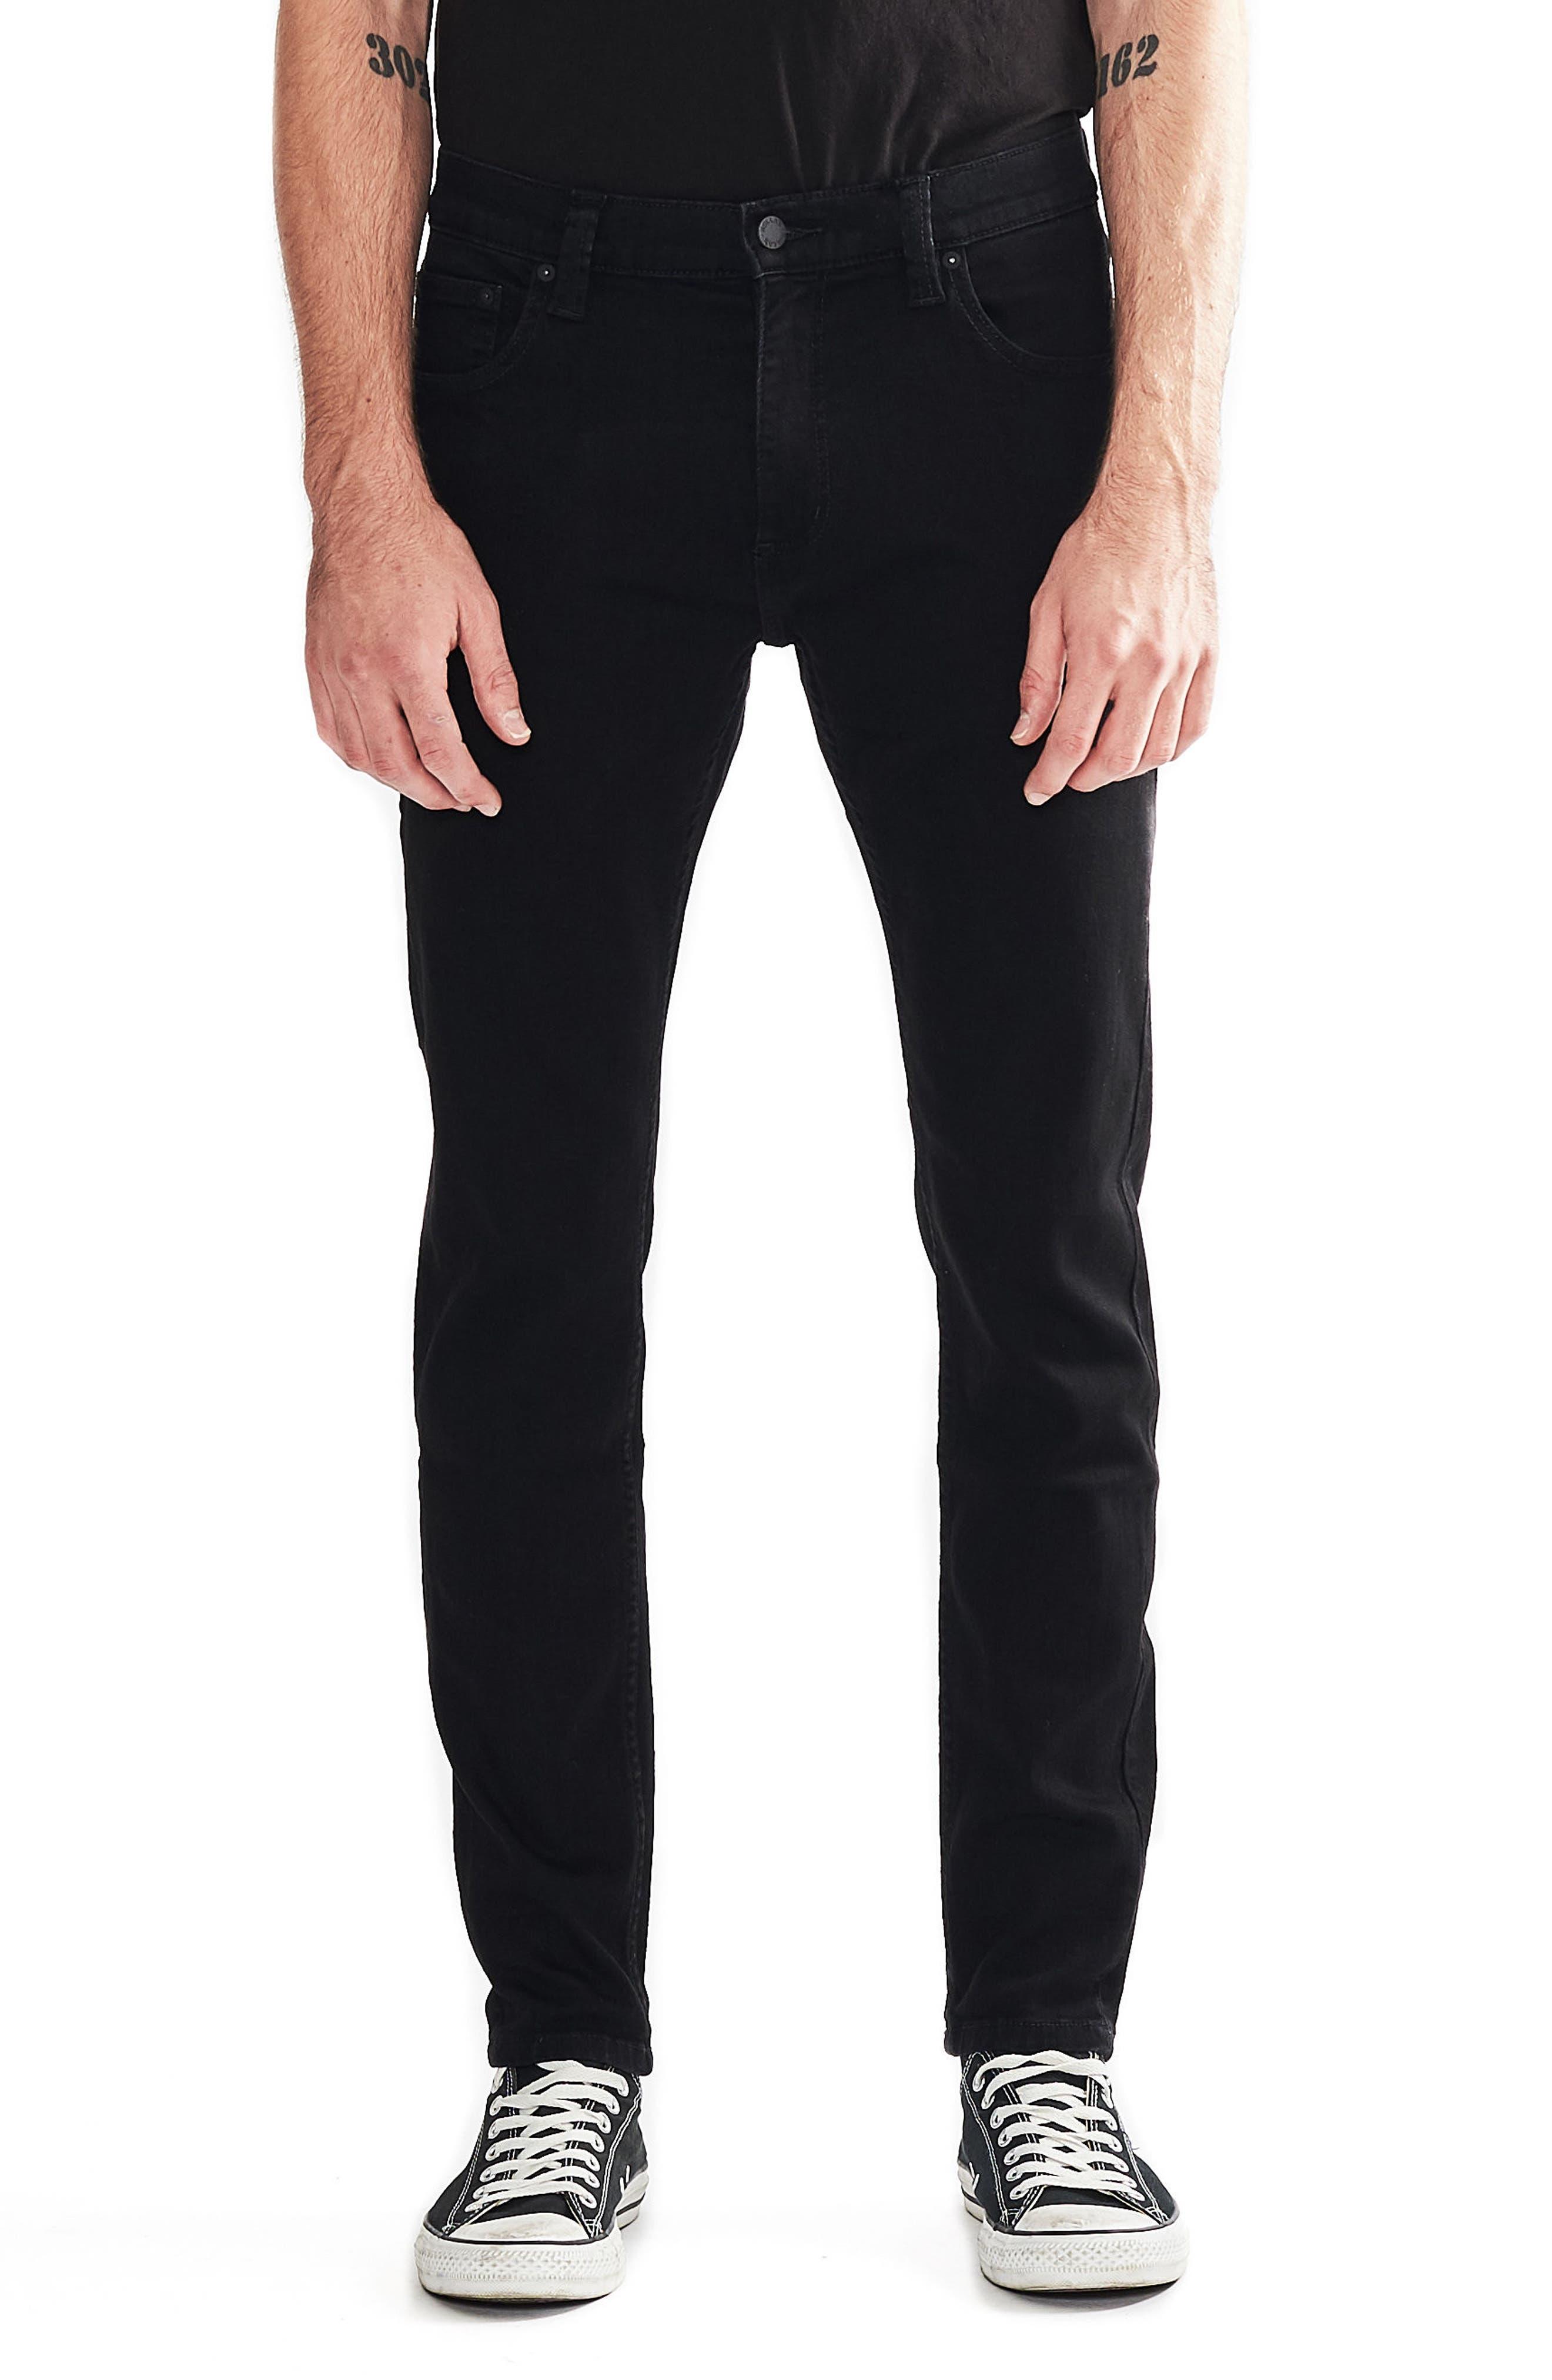 ROLLA'S,                             Stinger Skinny Fit Jeans,                             Main thumbnail 1, color,                             BLACK GOLD